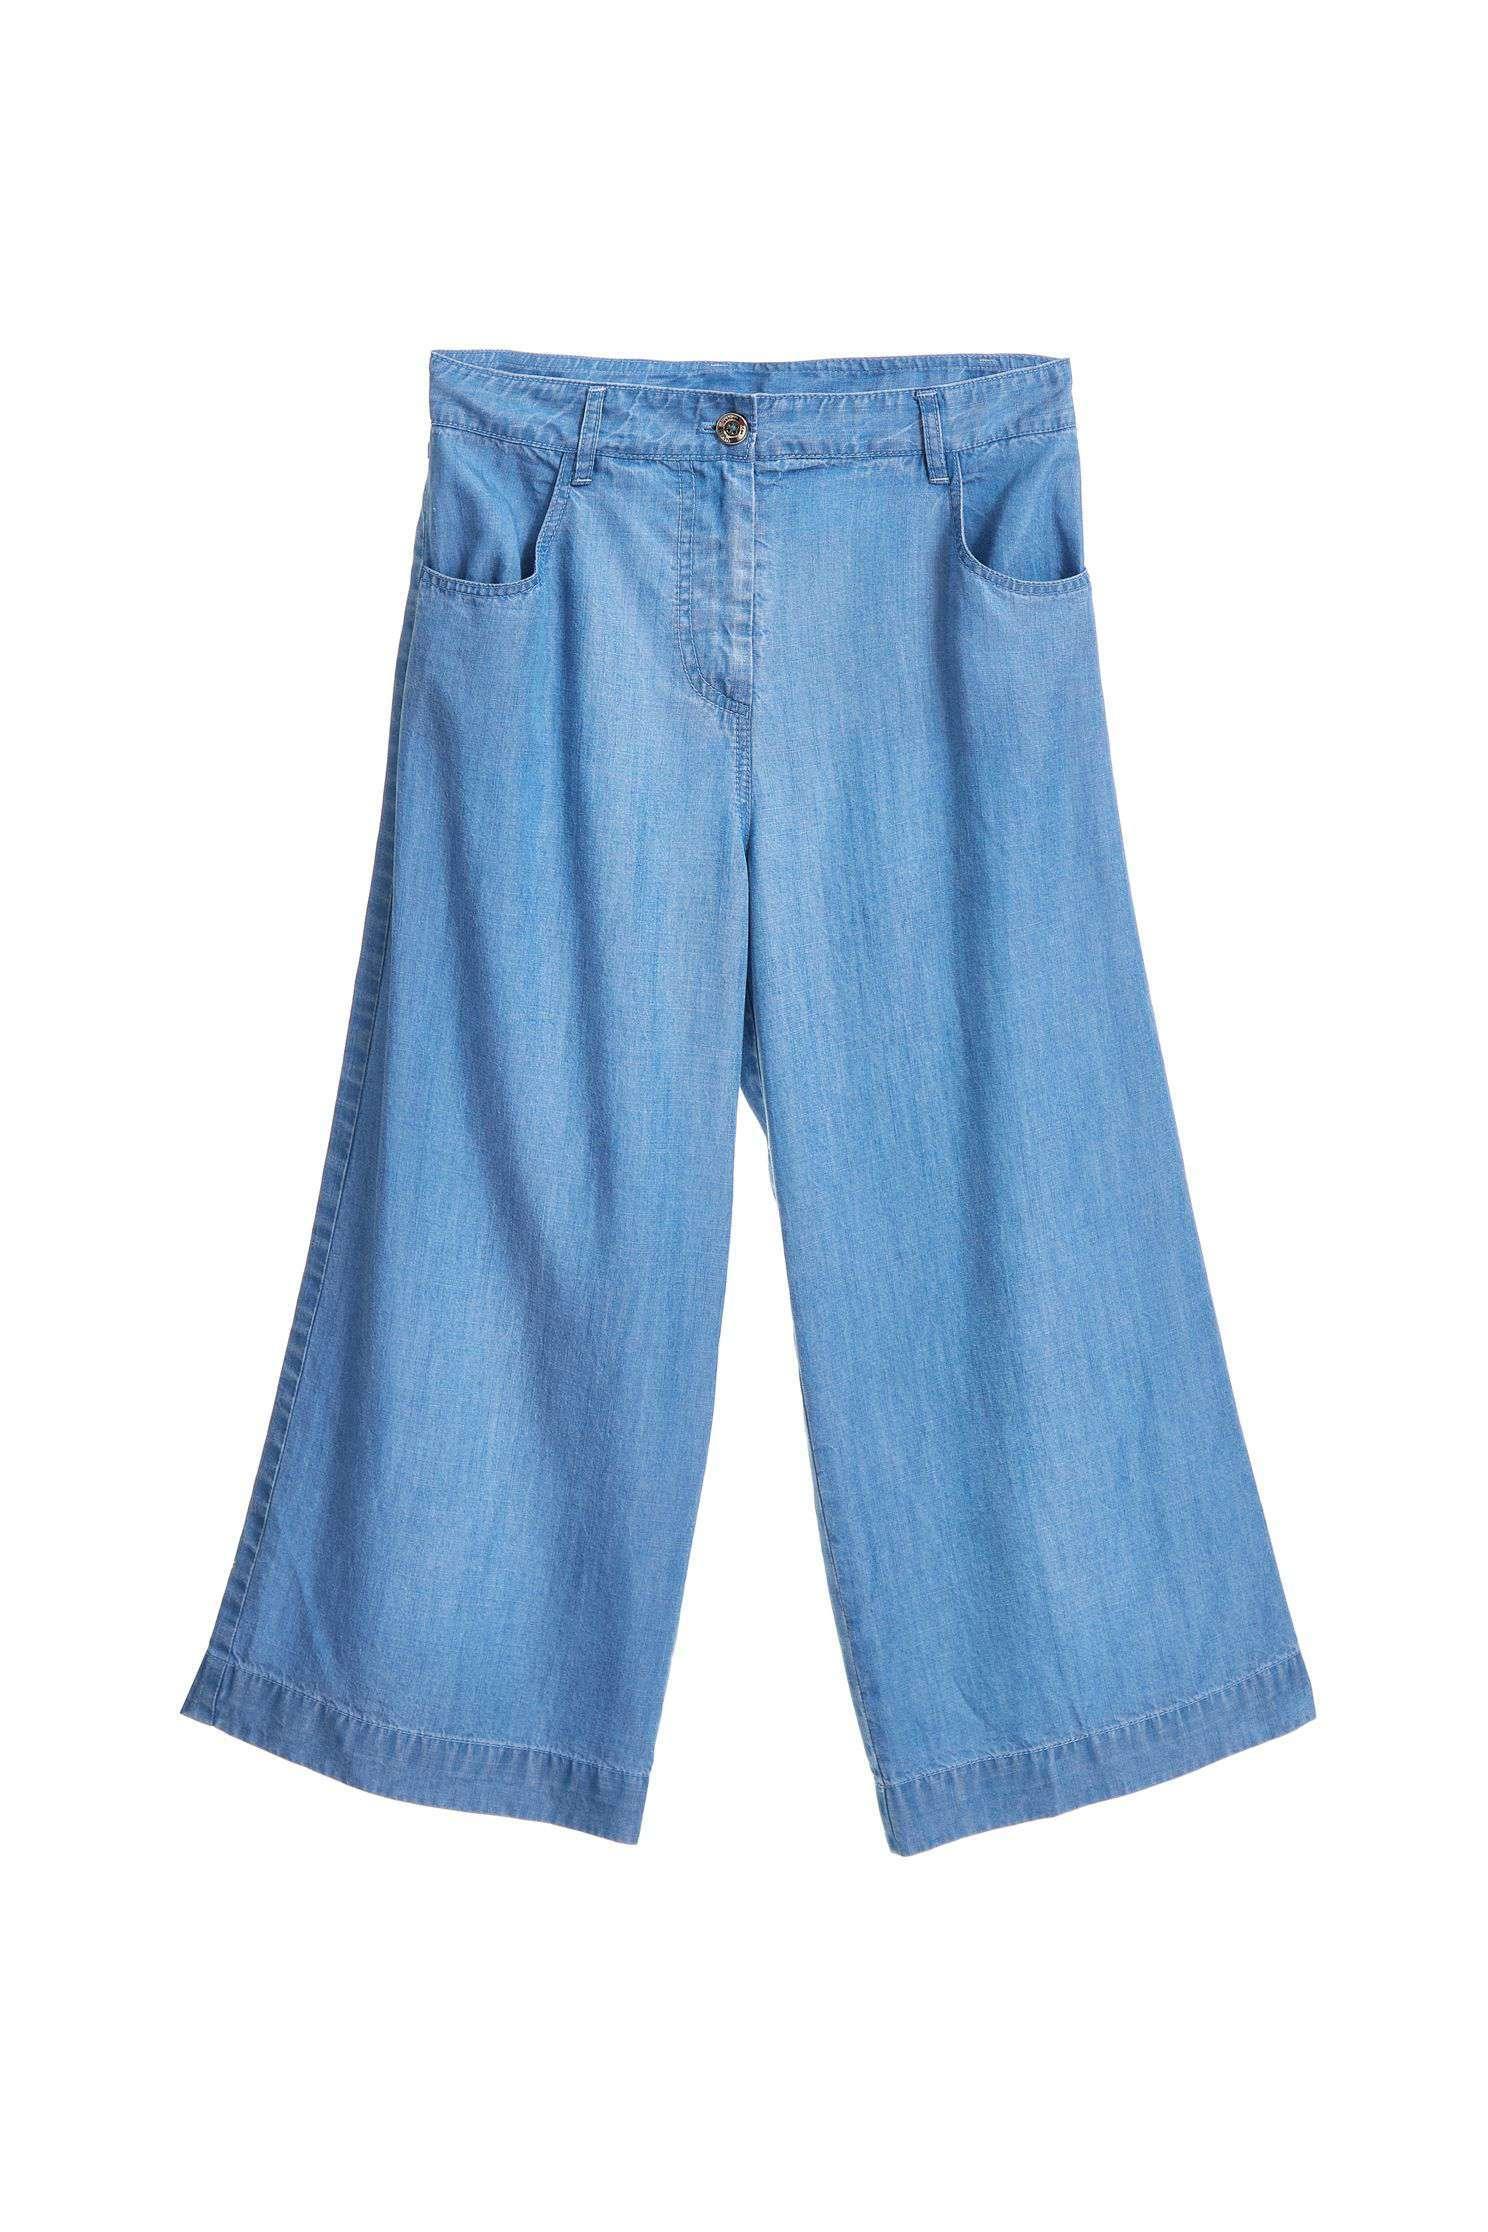 Popular design denim culottes